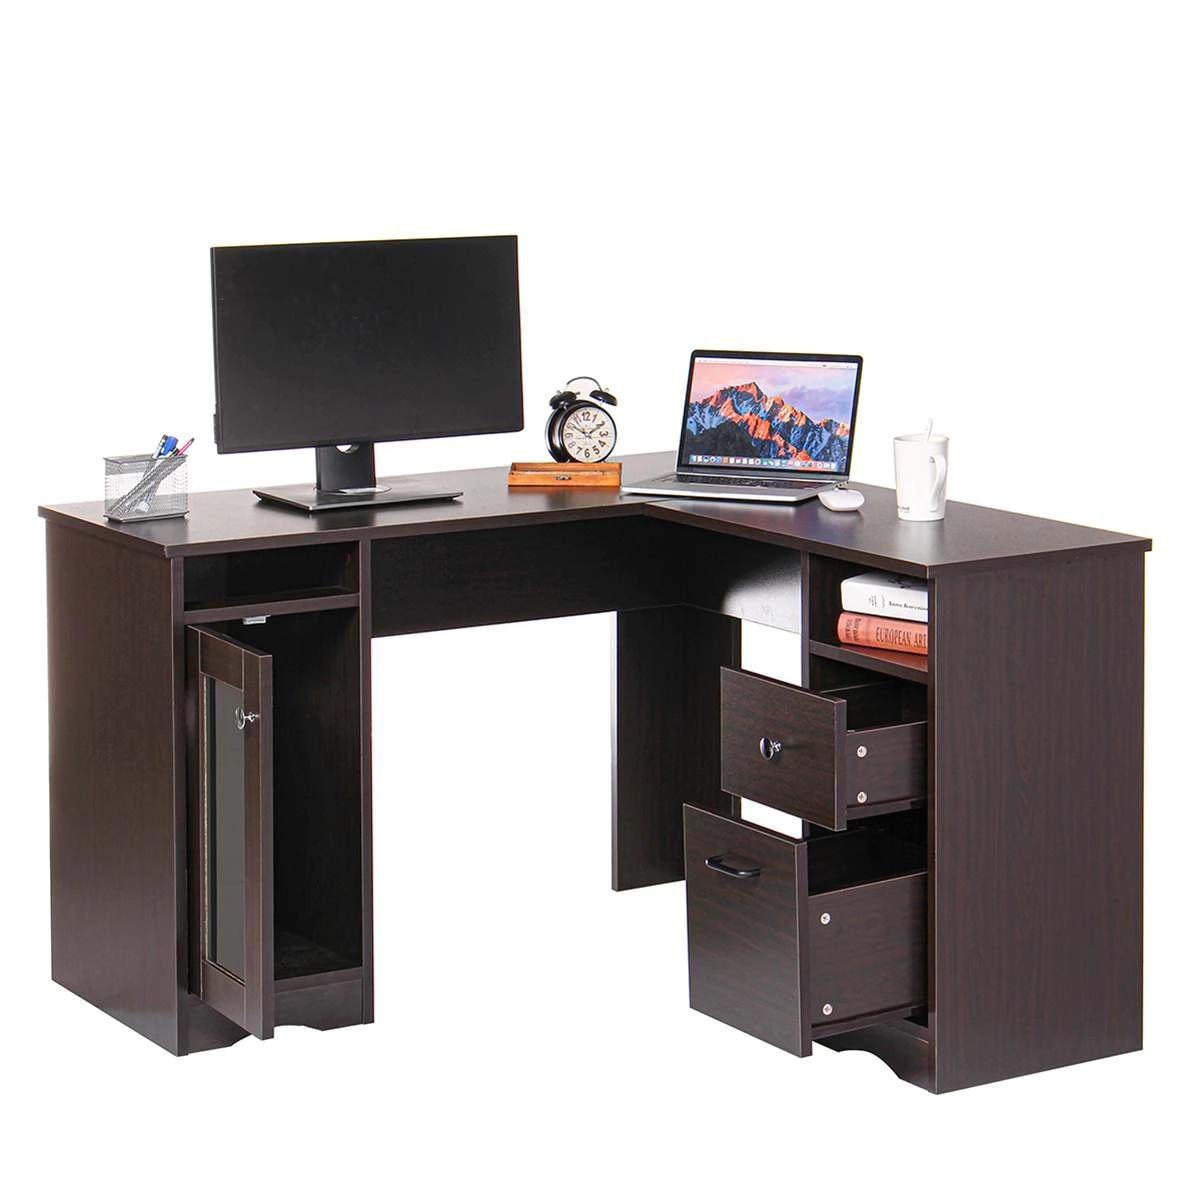 Picture of: L Shaped Corner Computer Desk Large Capacity Laptop Stand Desktop Study Table Office Furniture Workstation Home Gaming Table Laptop Desks Aliexpress